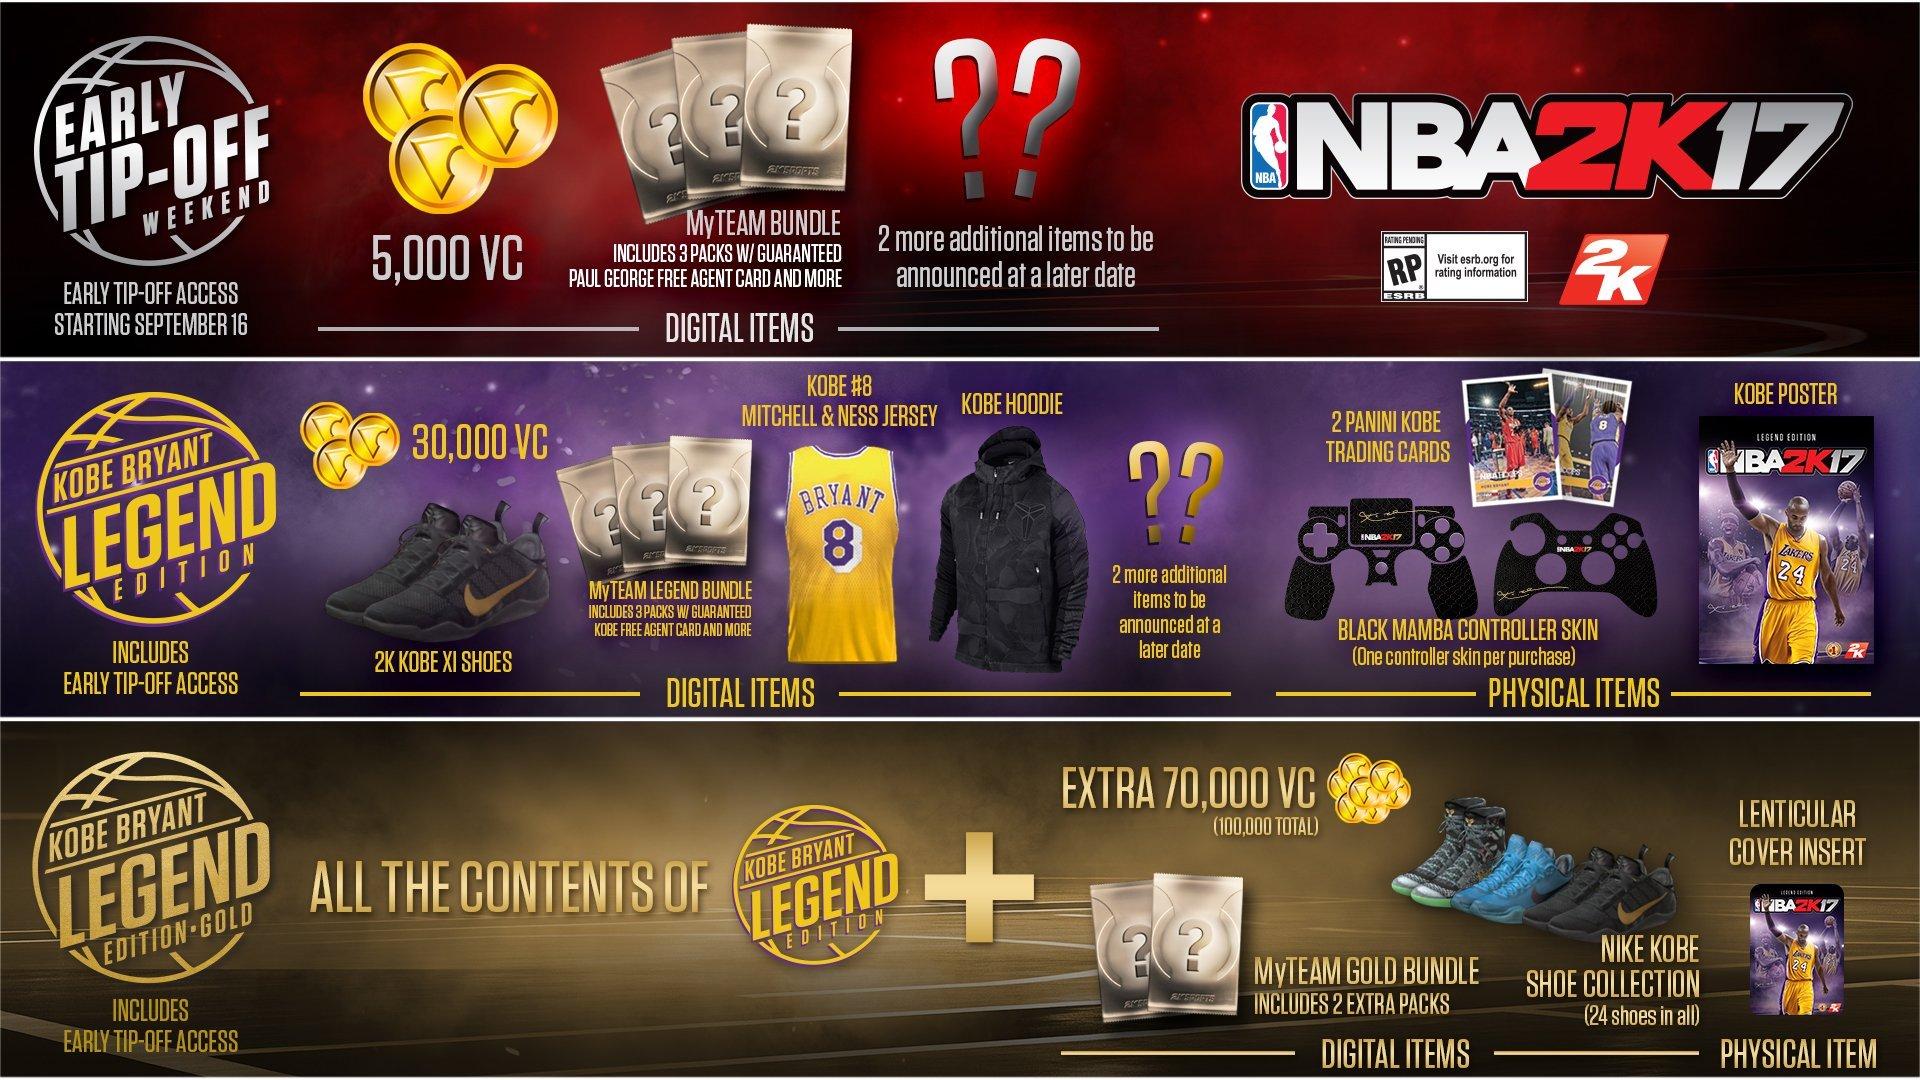 《NBA 2K17》预订奖励